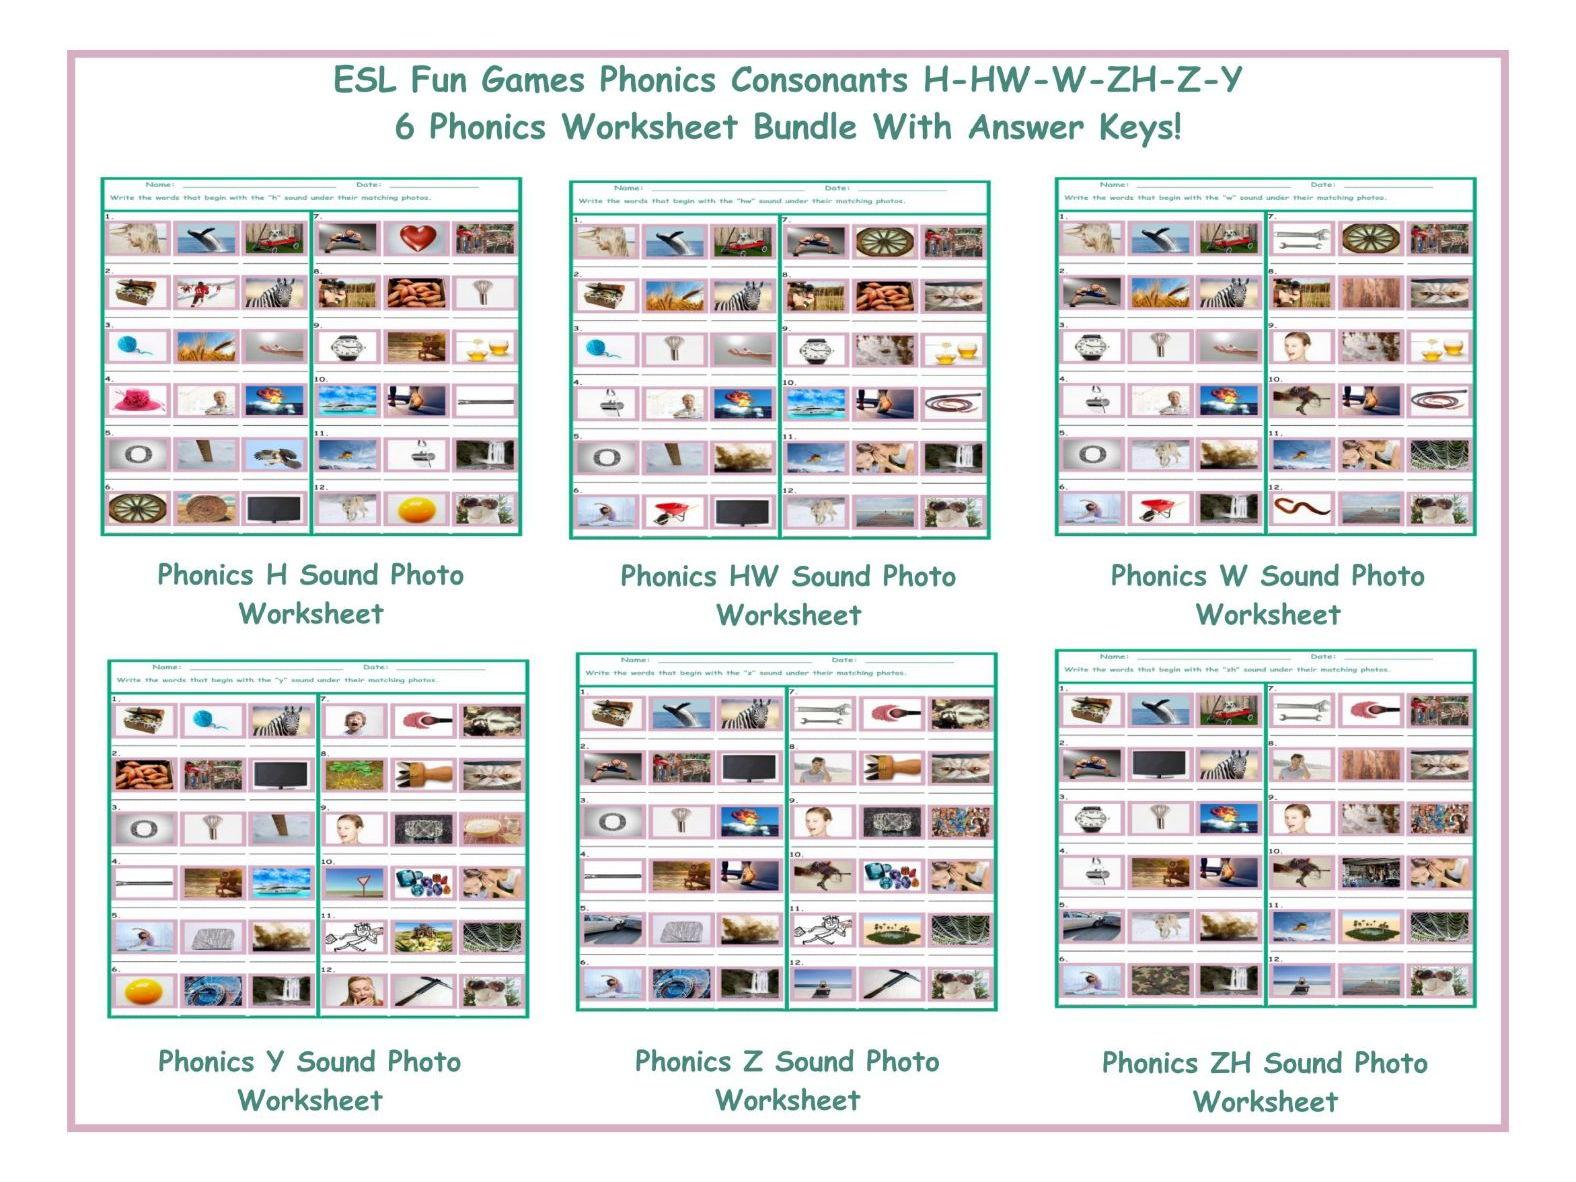 Workbooks kn sound worksheets : Phonics M Sound Photo Worksheet by eslfungames - Teaching ...